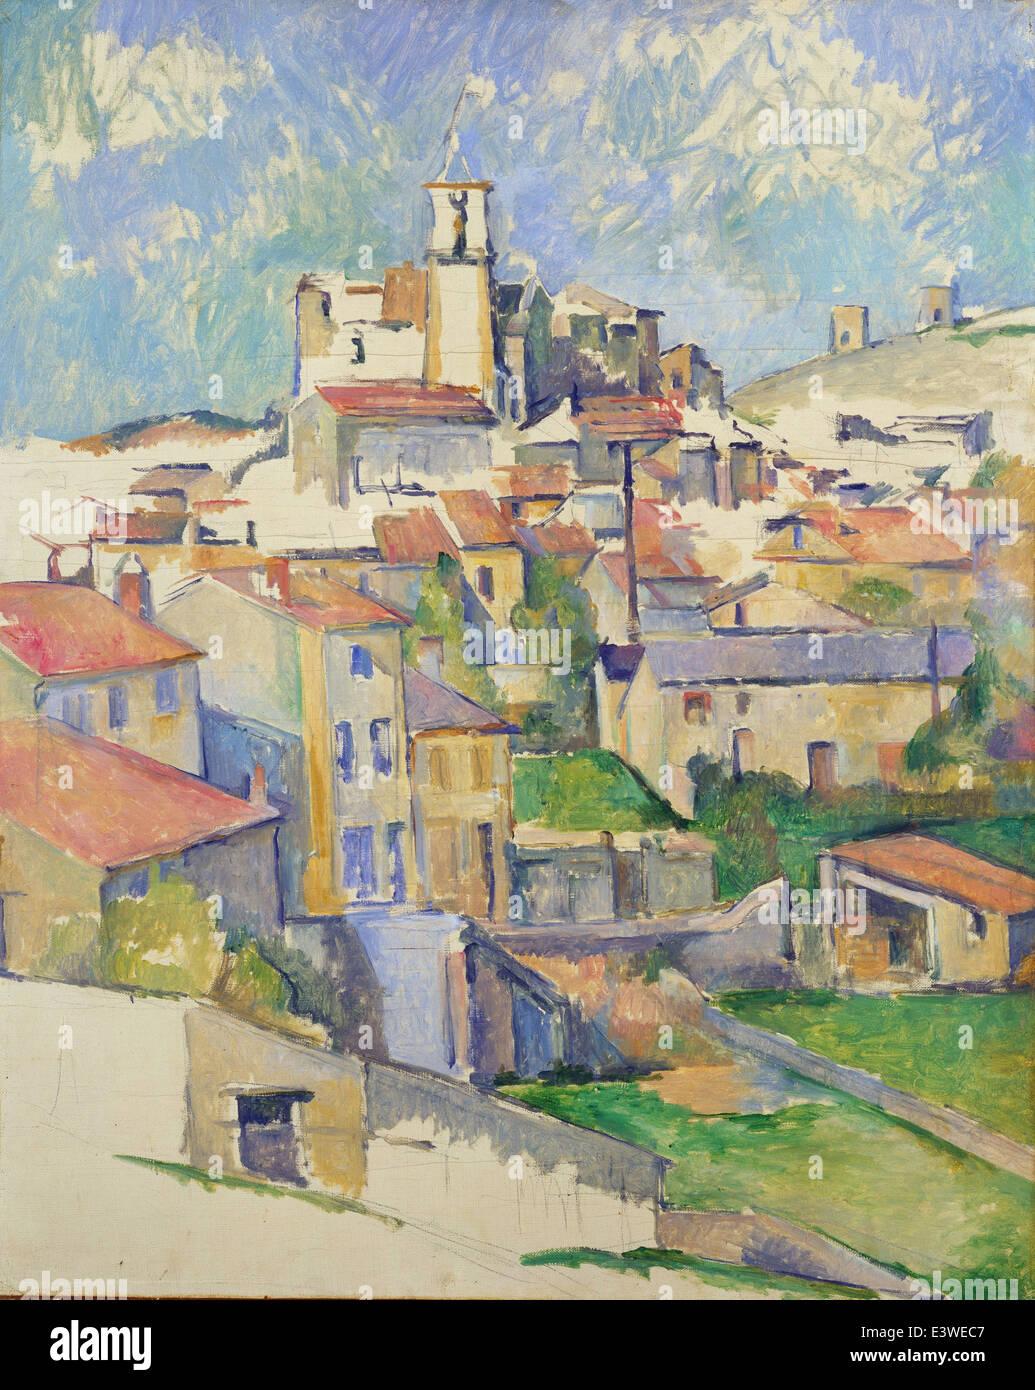 Paul Cézanne - Gardanne - 1886 - MET Museum - New-York - Stock Image